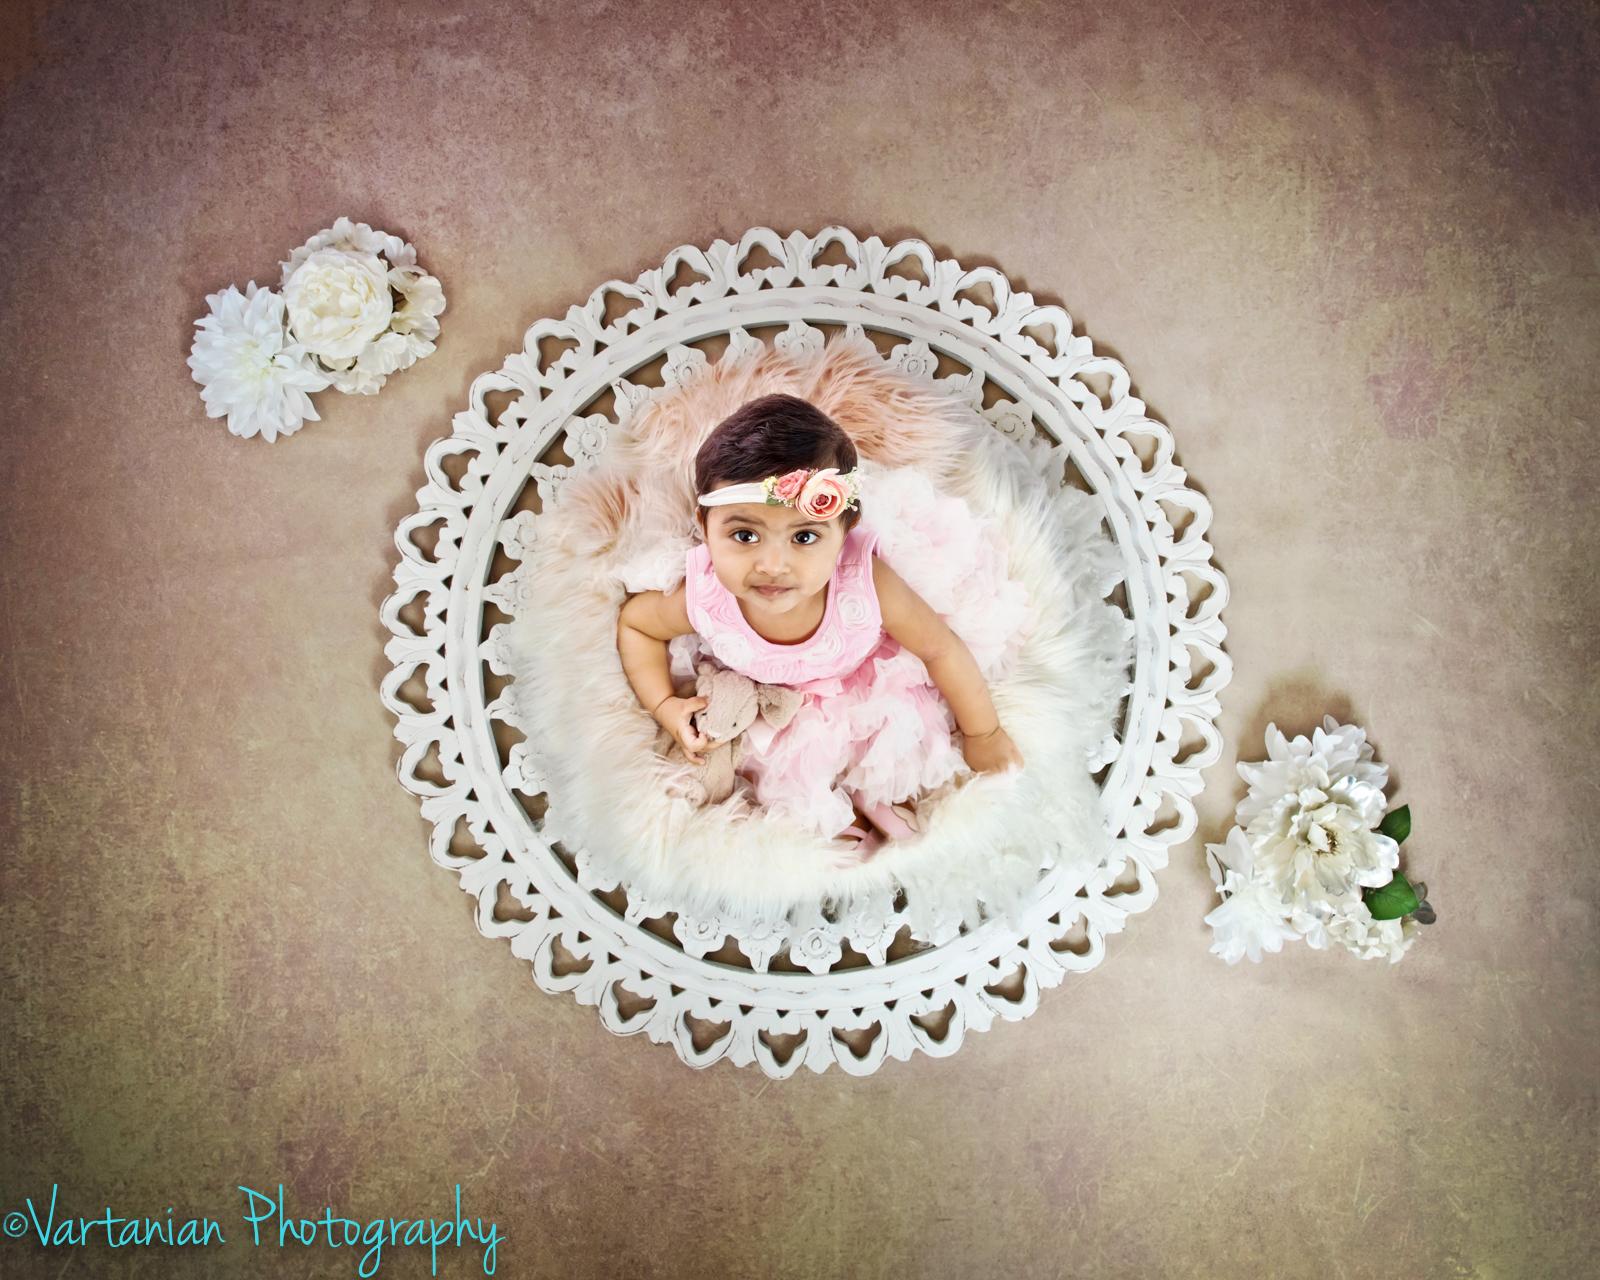 Livonia-Family-photographer-Vartanian-photography-9622.jpg